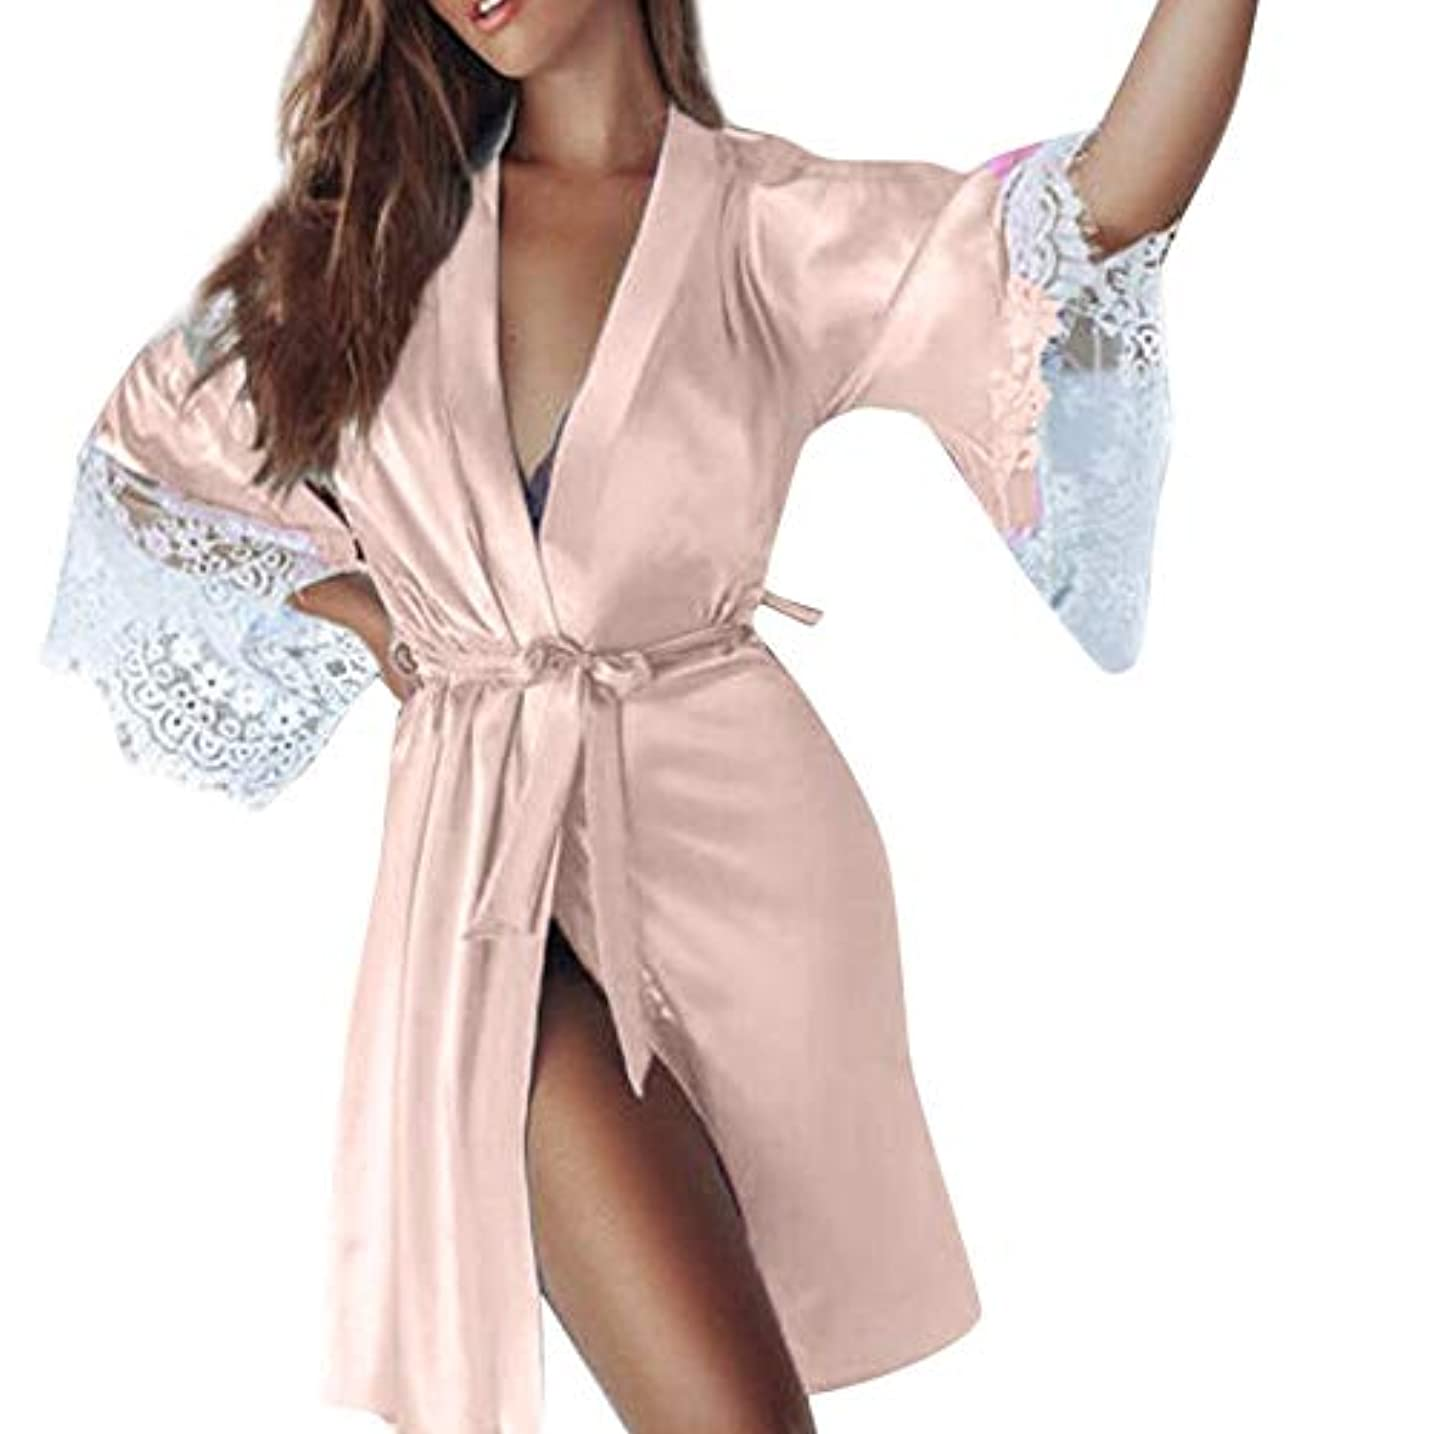 Joielmal 女性用バスローブ ガウンバスローブ ローブ 浴衣式 ワンピース 前開き サテン生地 シルクのような肌触り おしゃれ 長袖 ロング丈 着物 レース飾り ワンサイズ 春 夏 S-3XL